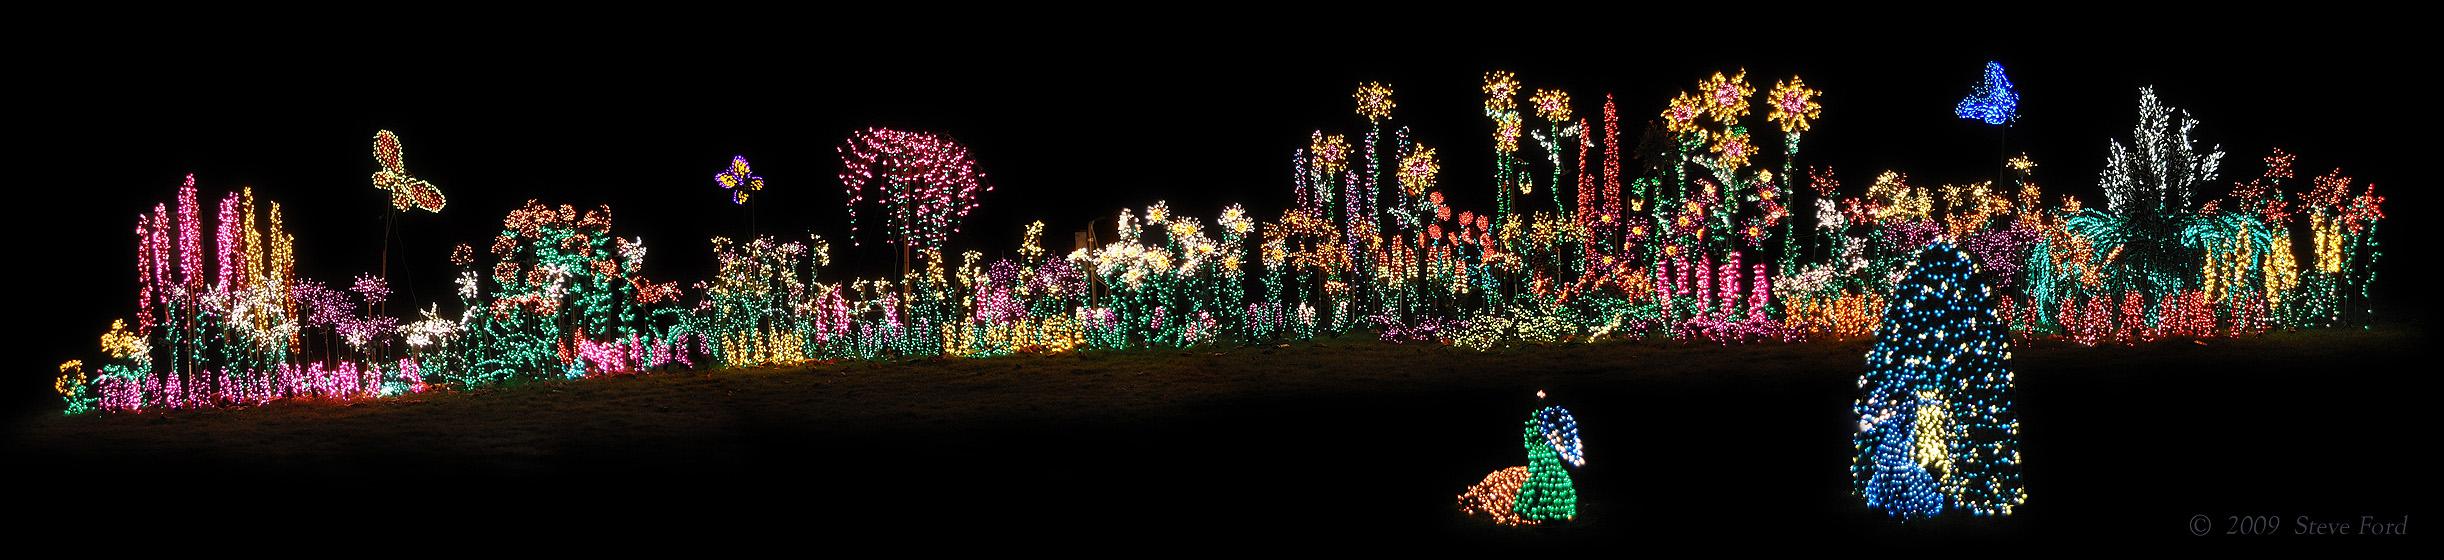 Bellevue Botanical Garden 2009 Light Show By Malamuteman Newsvine